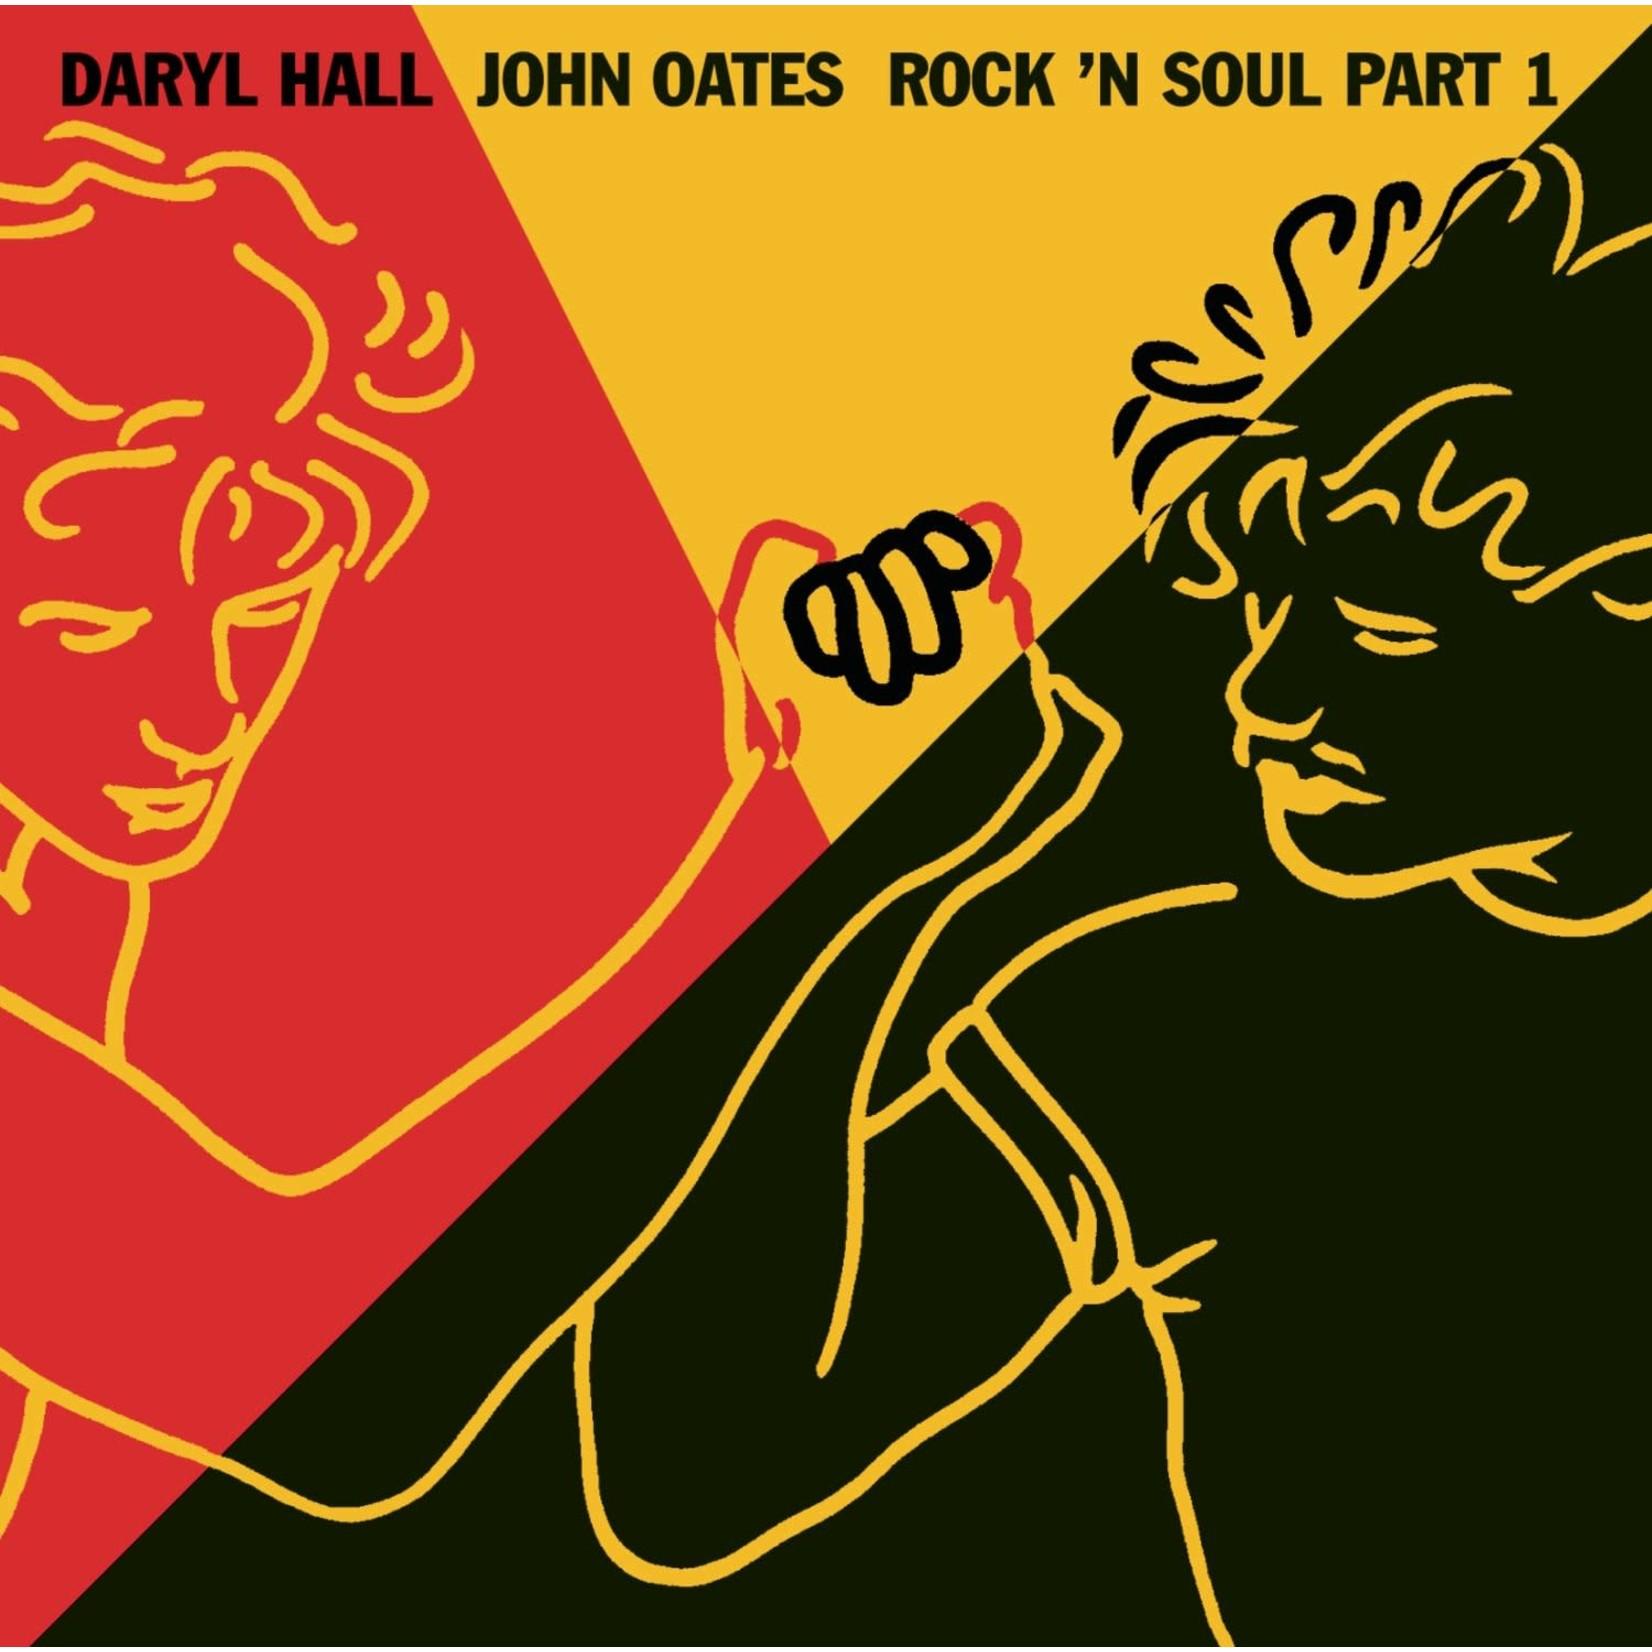 [Vintage] Hall, Daryl & John Oates: Rock & Soul Part 1 (Greatest Hits)